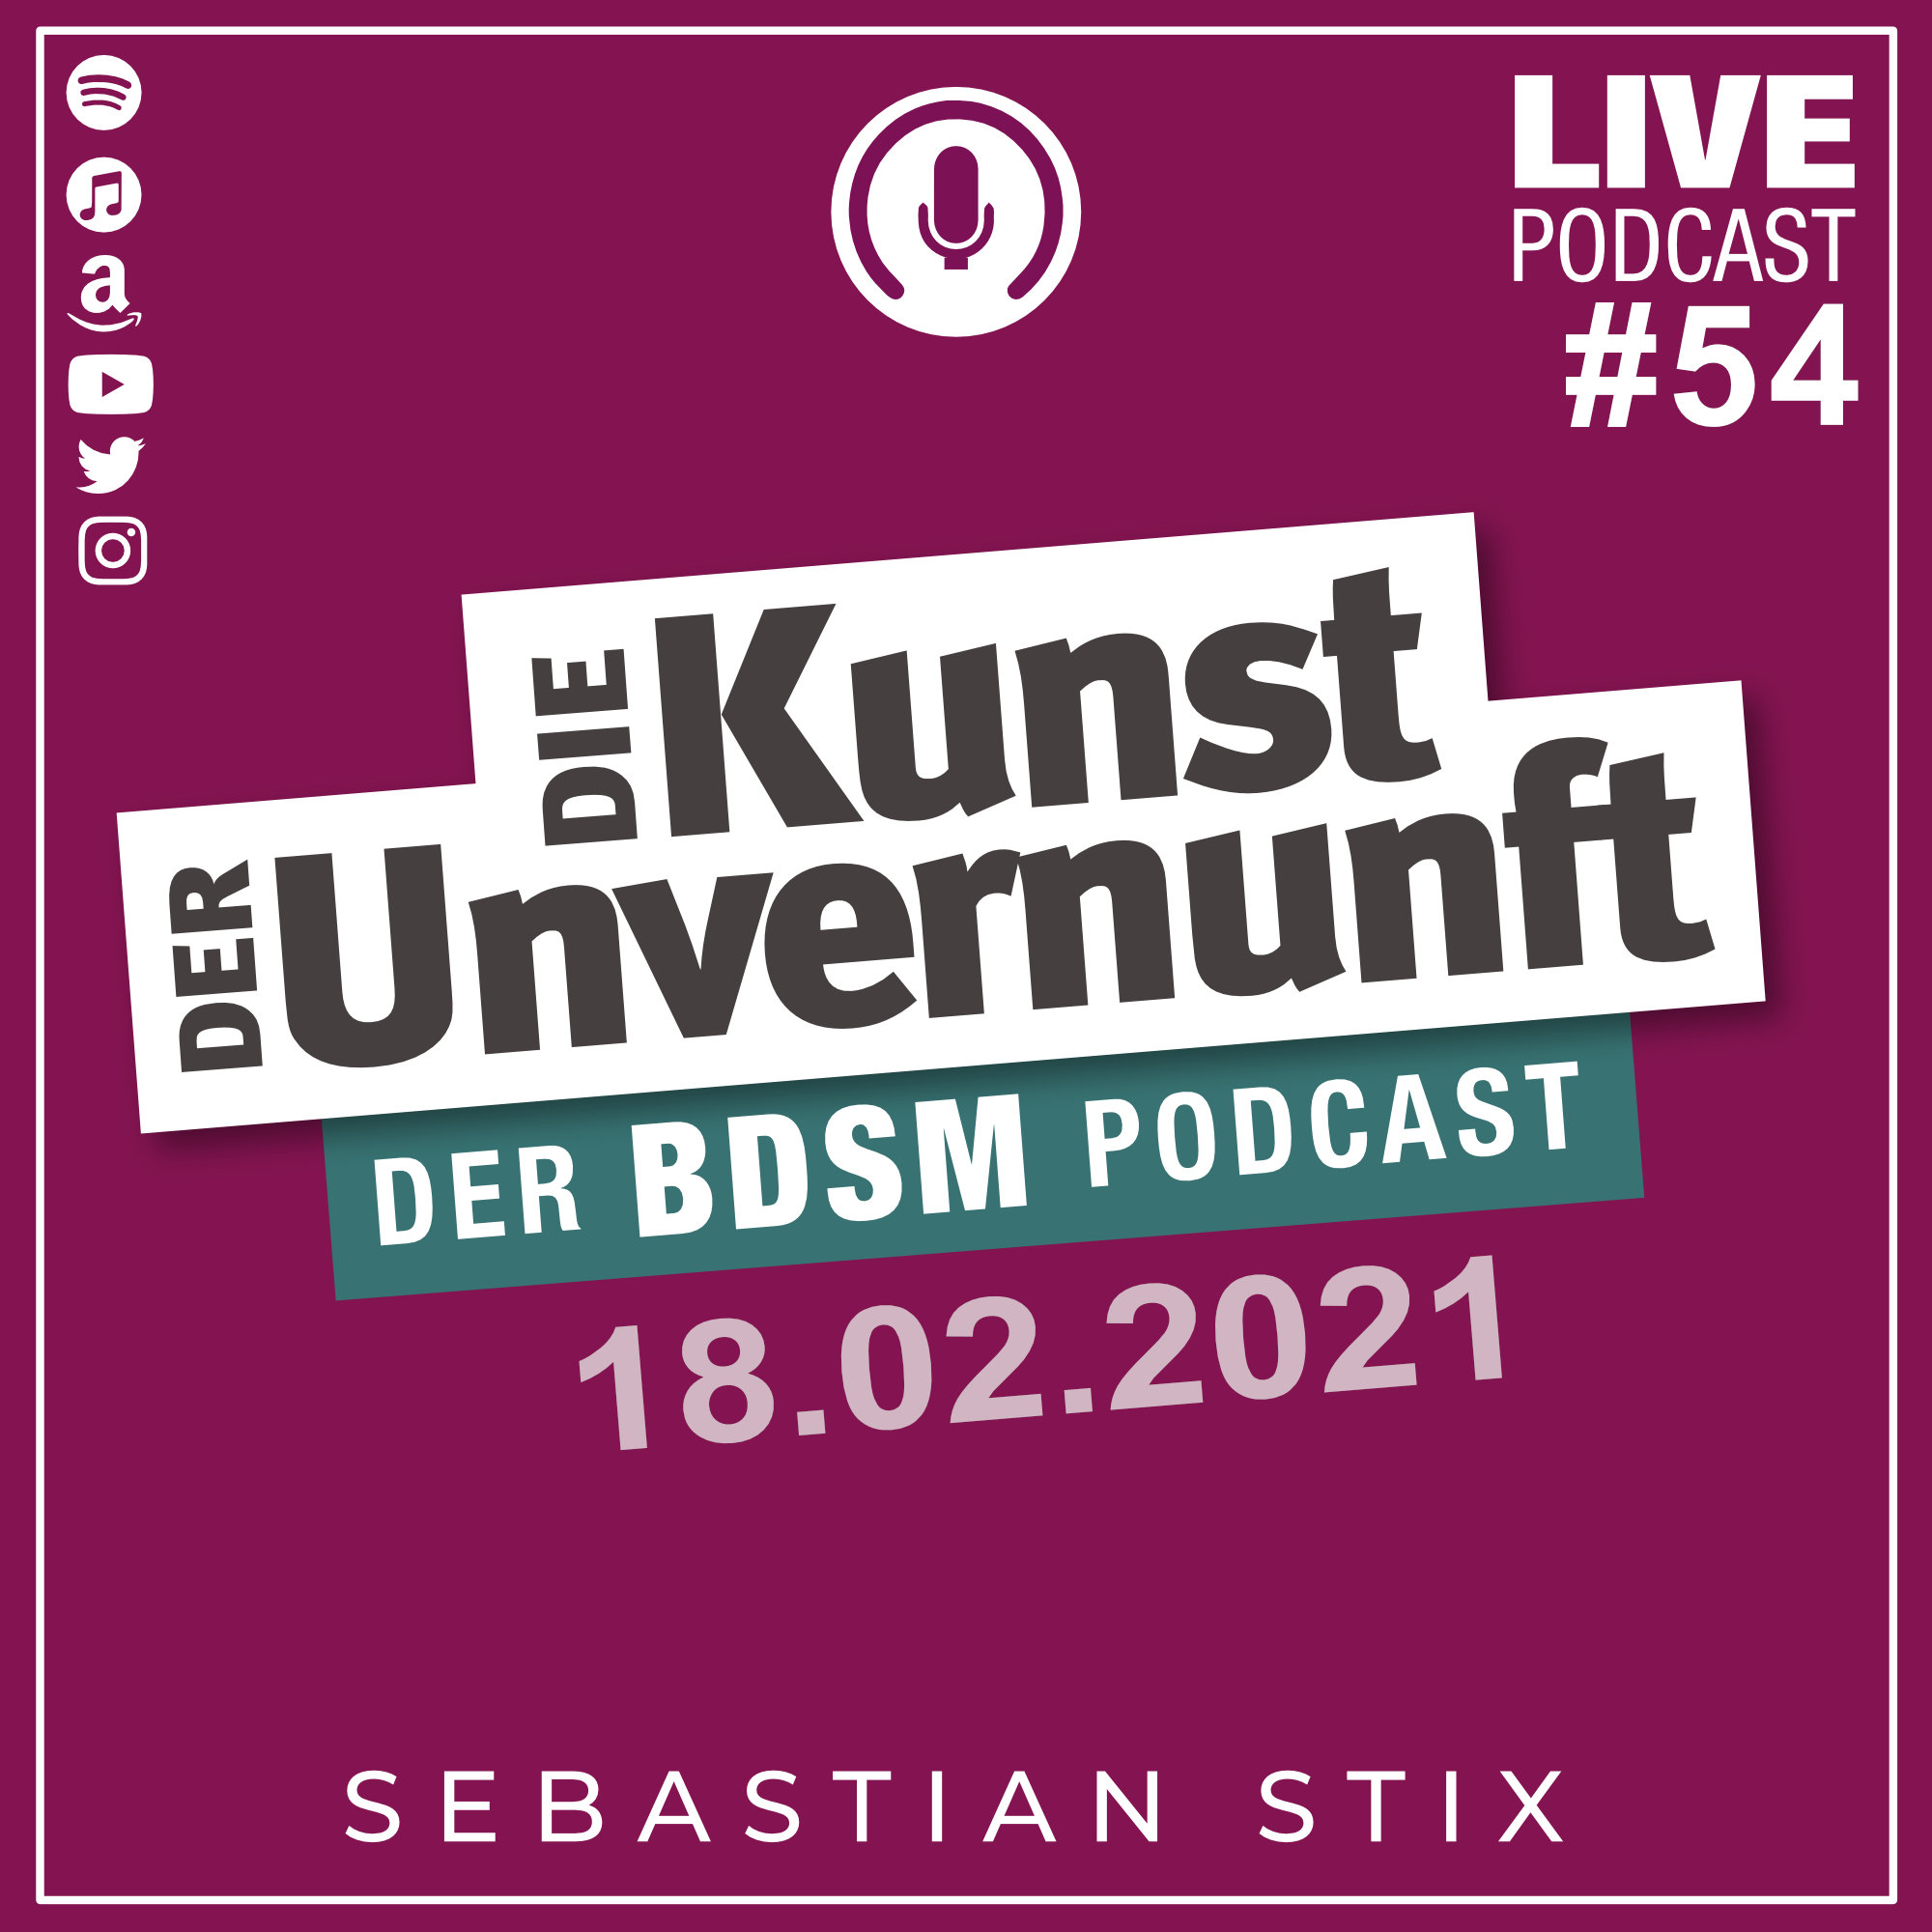 Unvernunft Live 18.02.2021 - Muss BDSM ins Museum?